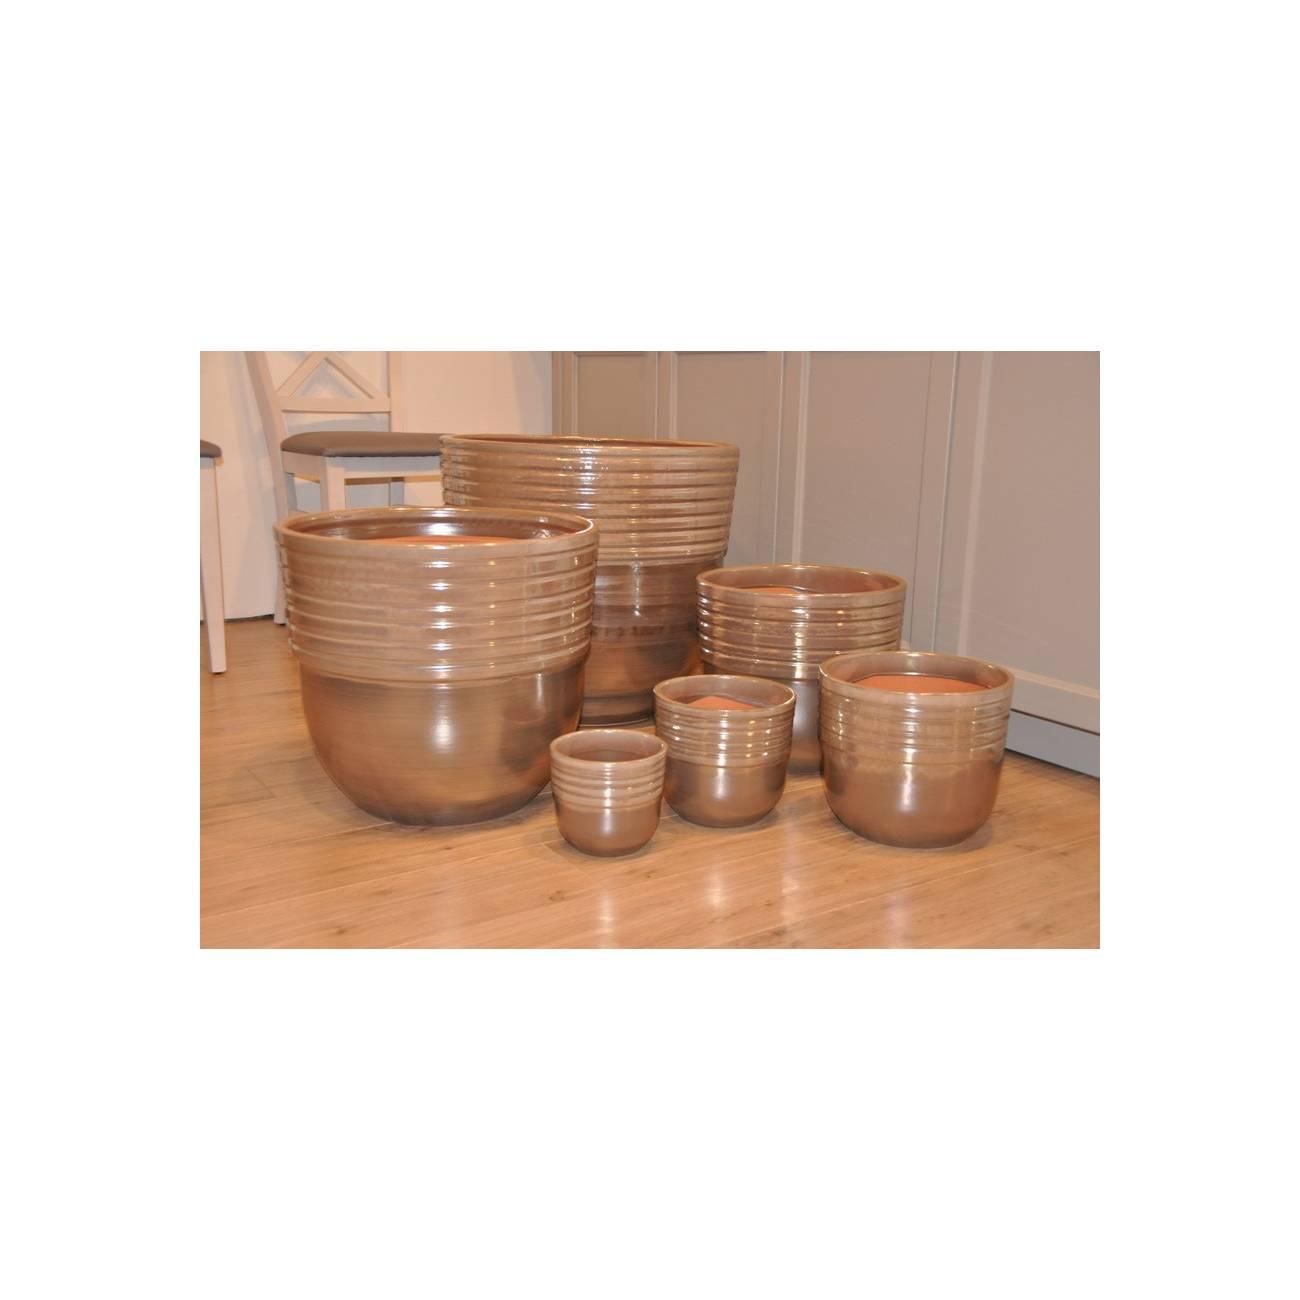 massaya terre d 39 amazonie poterie verte les poteries d 39 albi. Black Bedroom Furniture Sets. Home Design Ideas